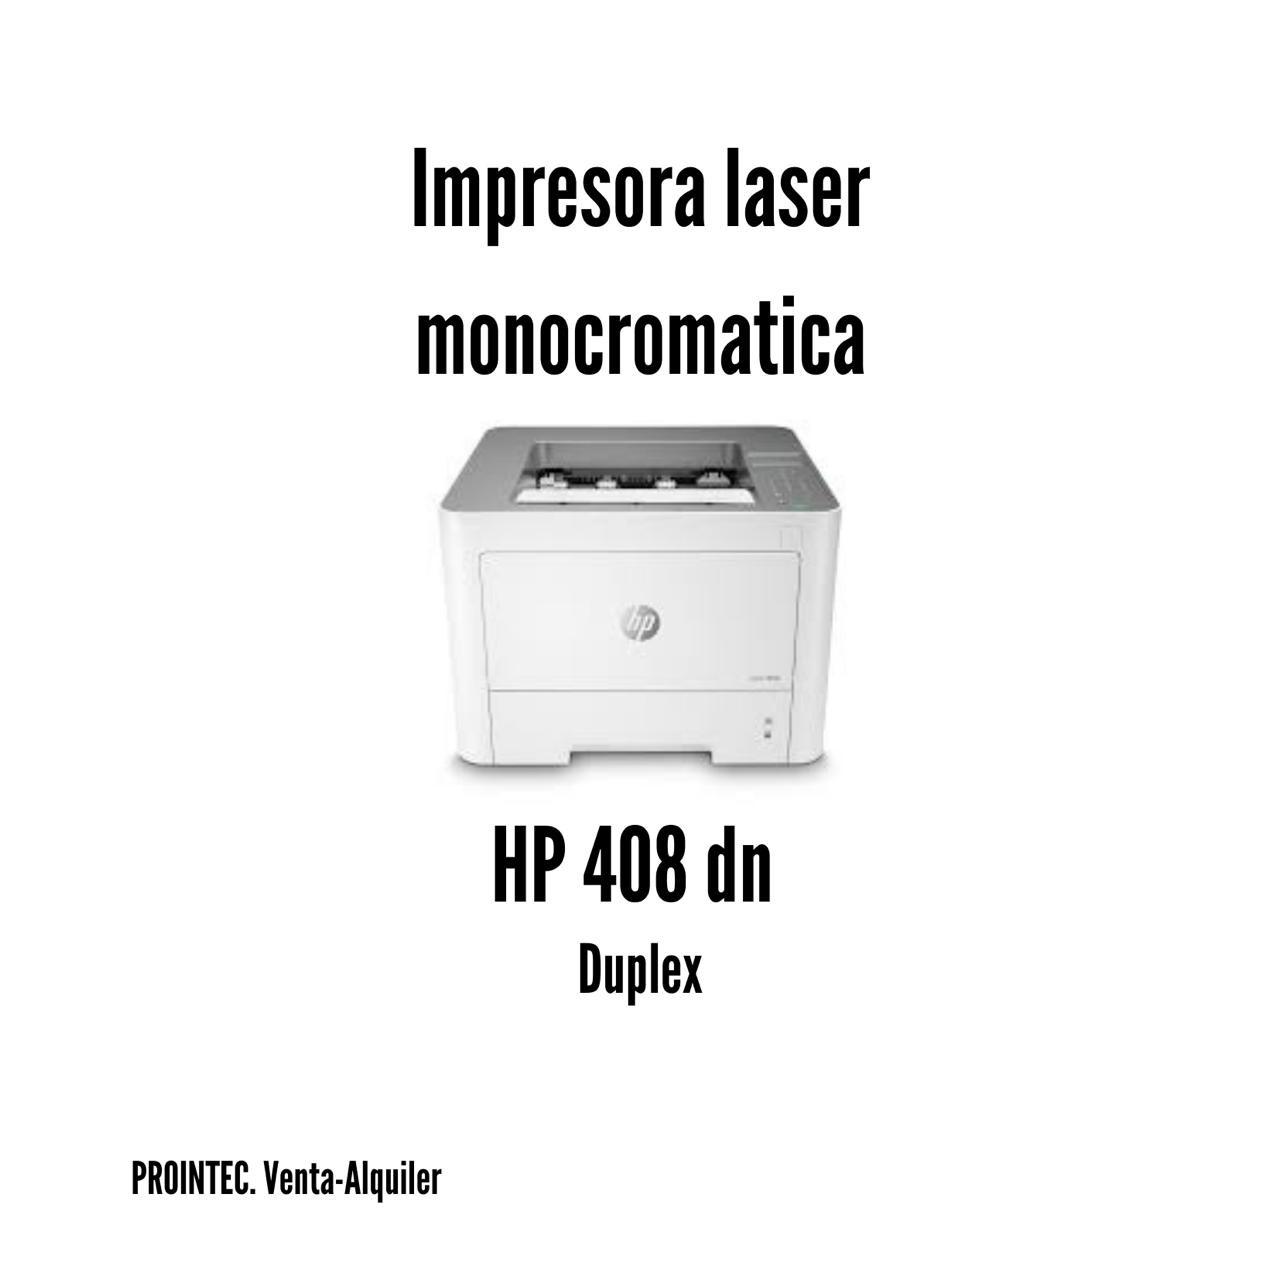 IMPRESORA LASER HP408 DN  LASERJET MONOCROMO